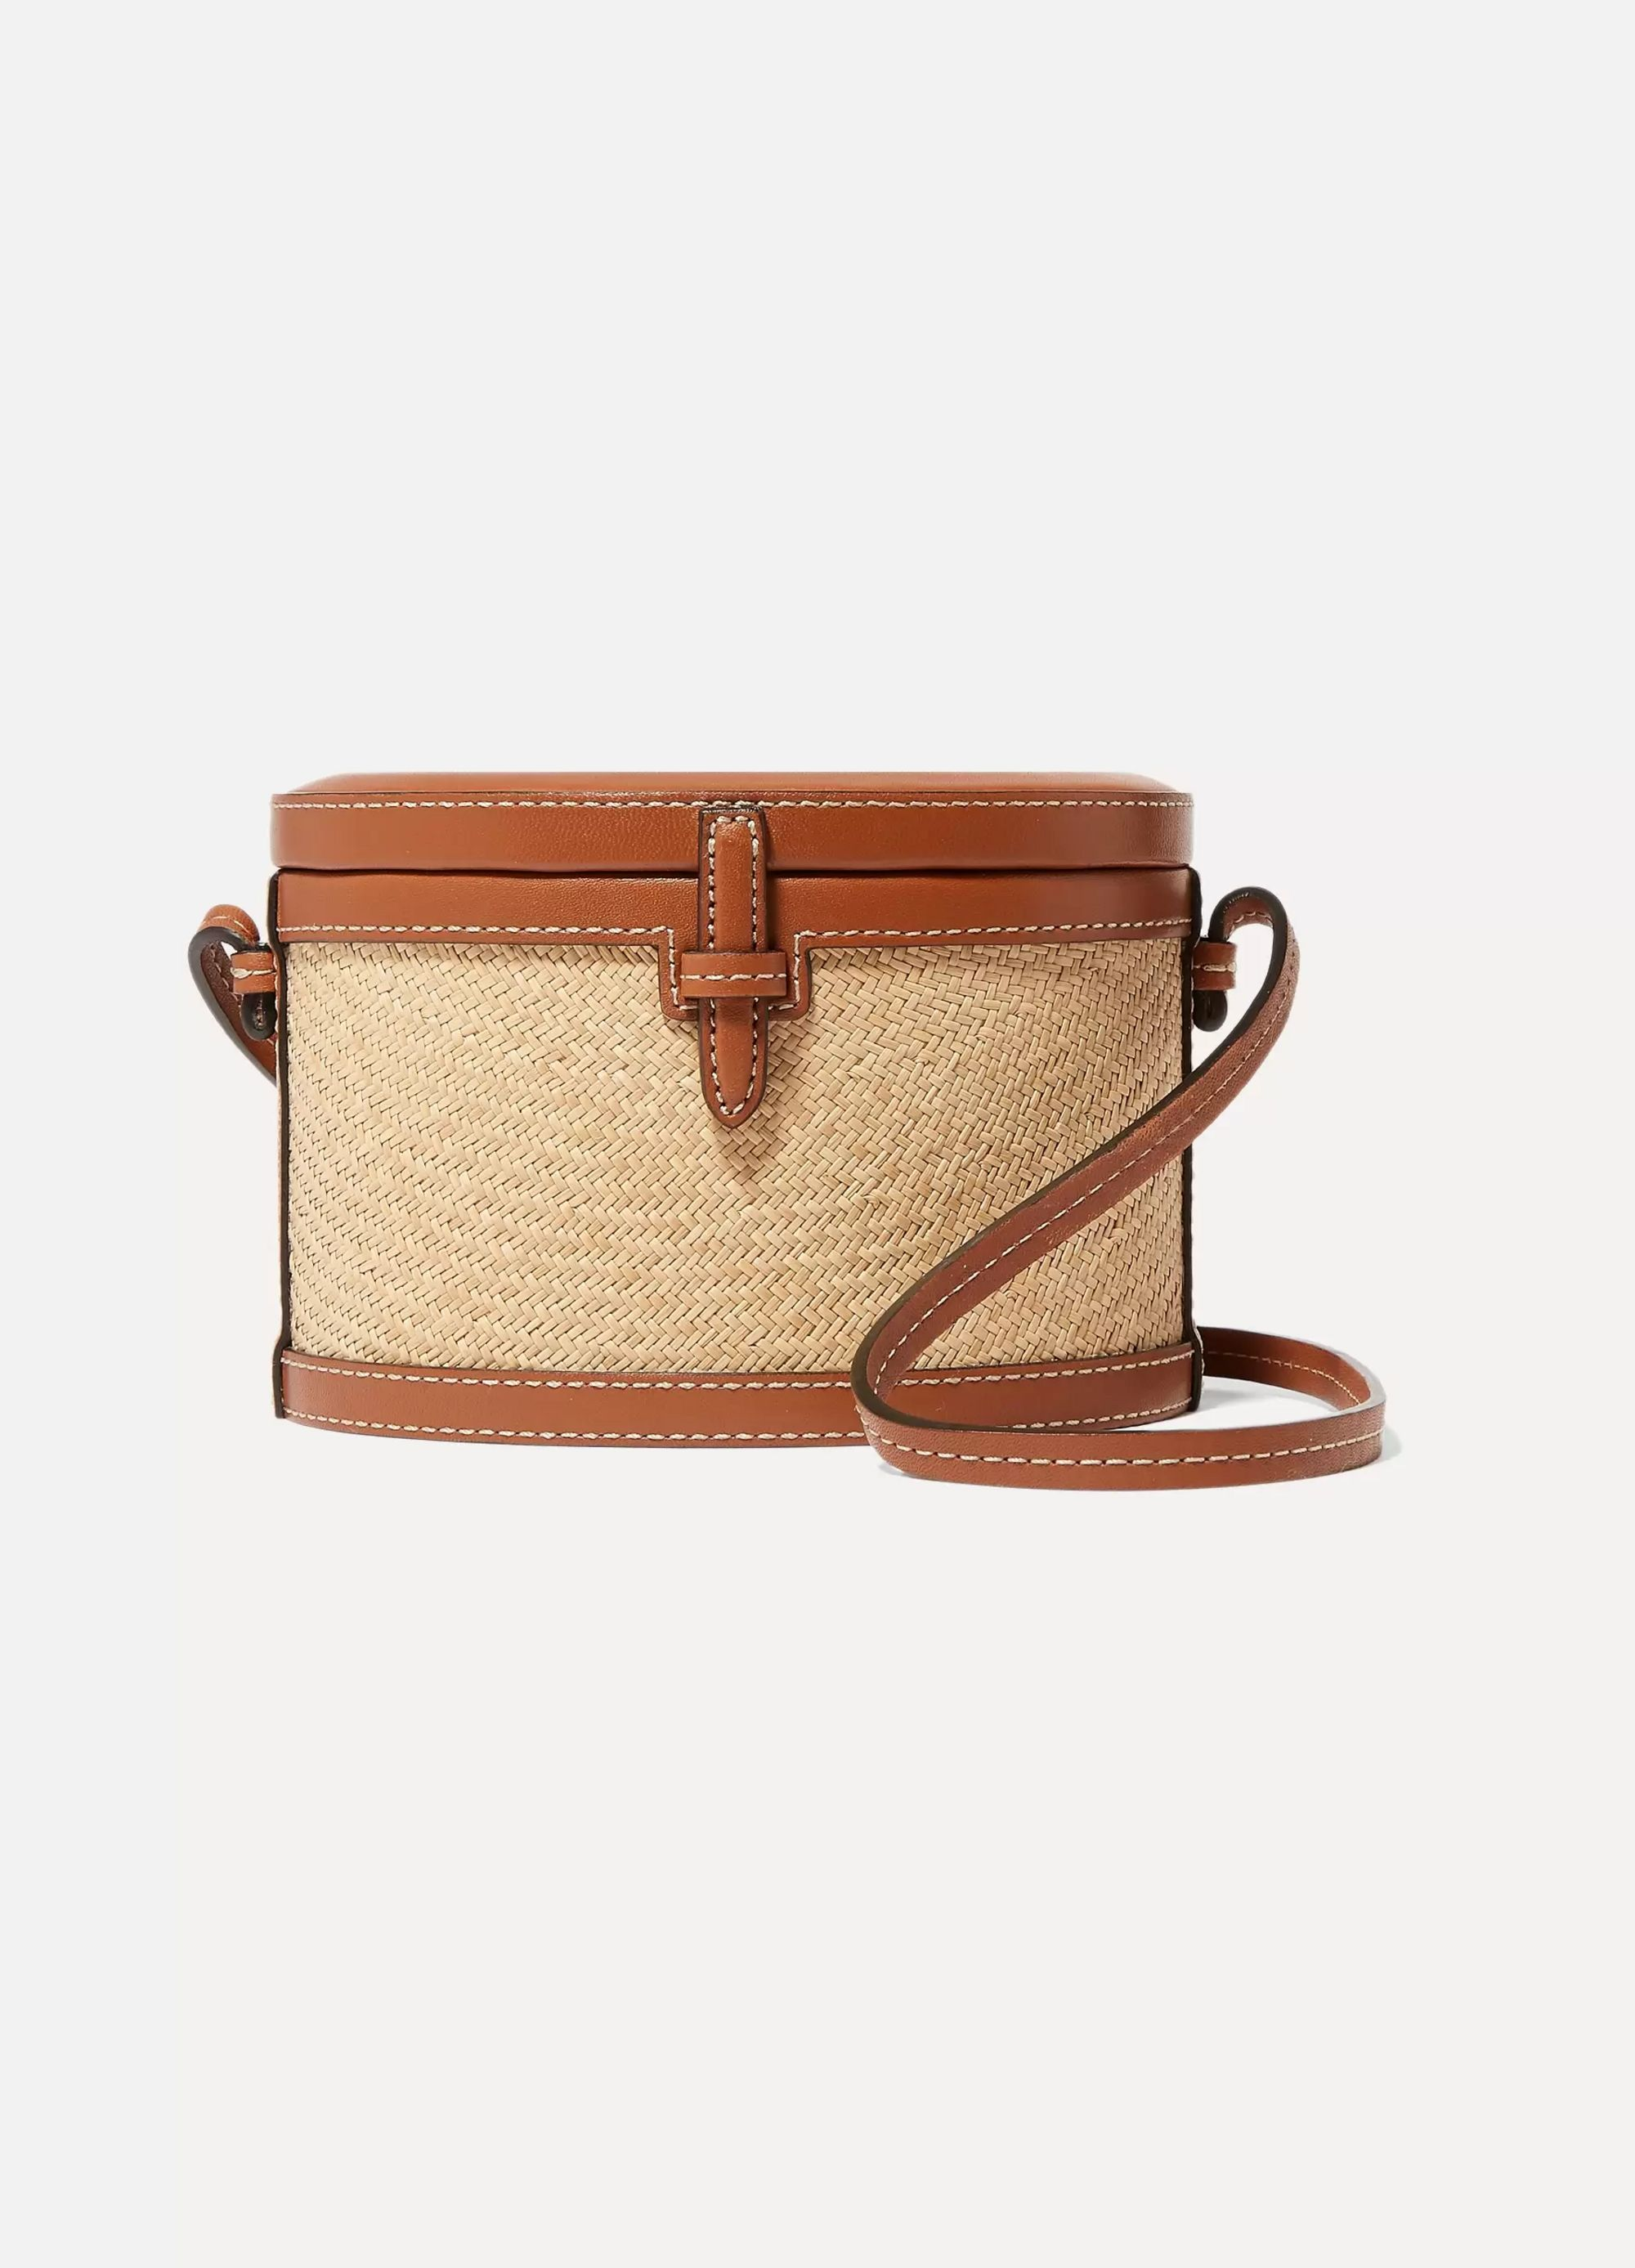 Hunting Season Trunk mini leather and raffia shoulder bag